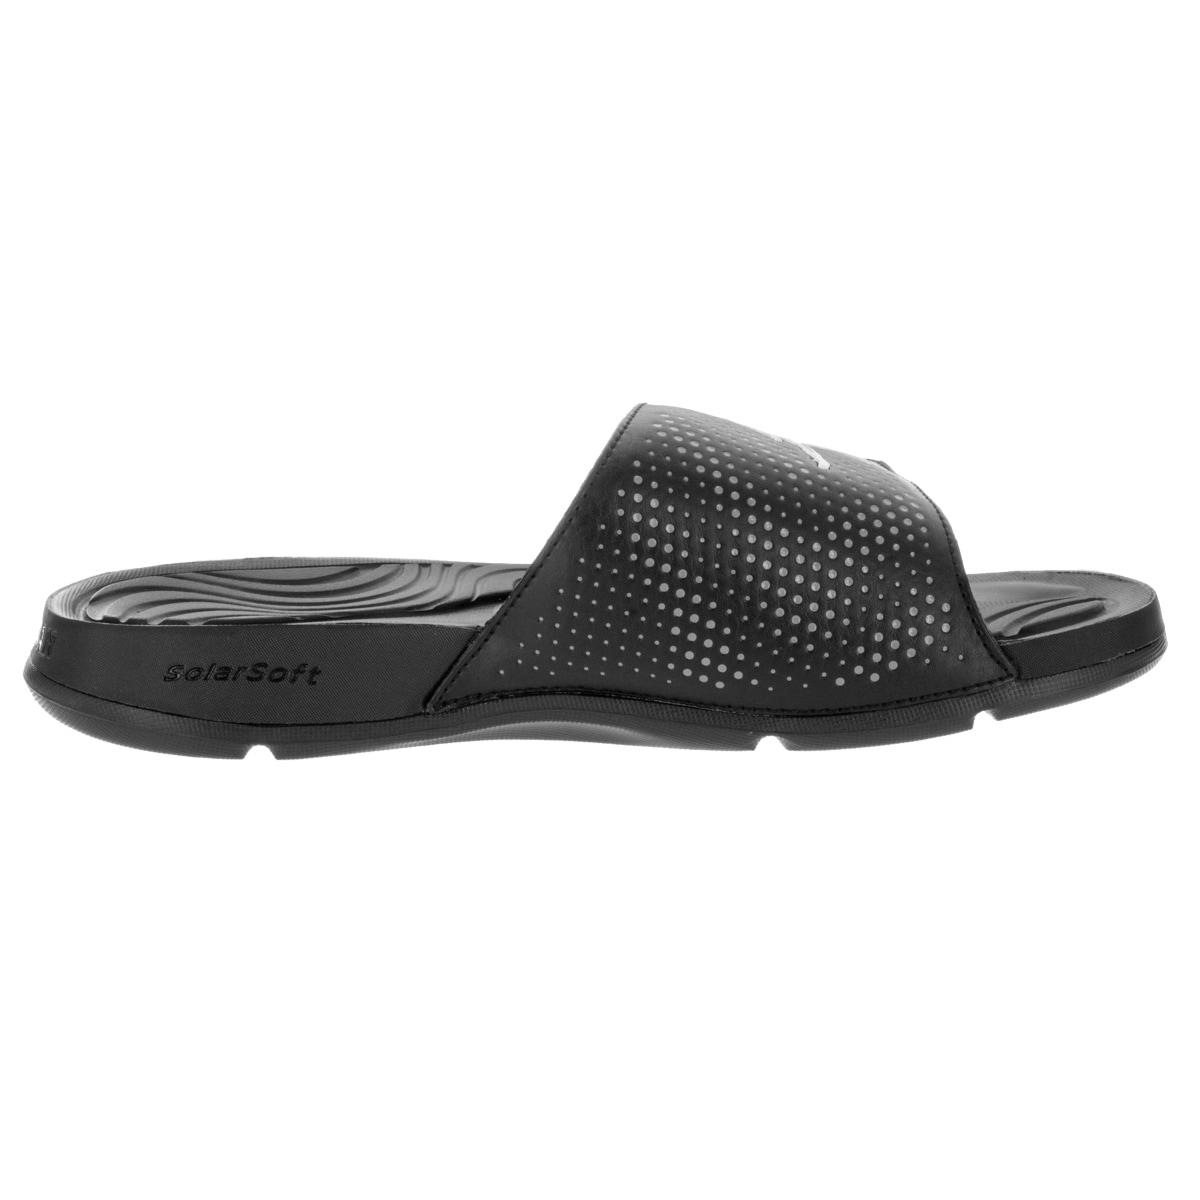 buy popular e4c2a b977a Shop Nike Jordan Men s Jordan Hydro 5 Sandal - Free Shipping Today -  Overstock - 12318203